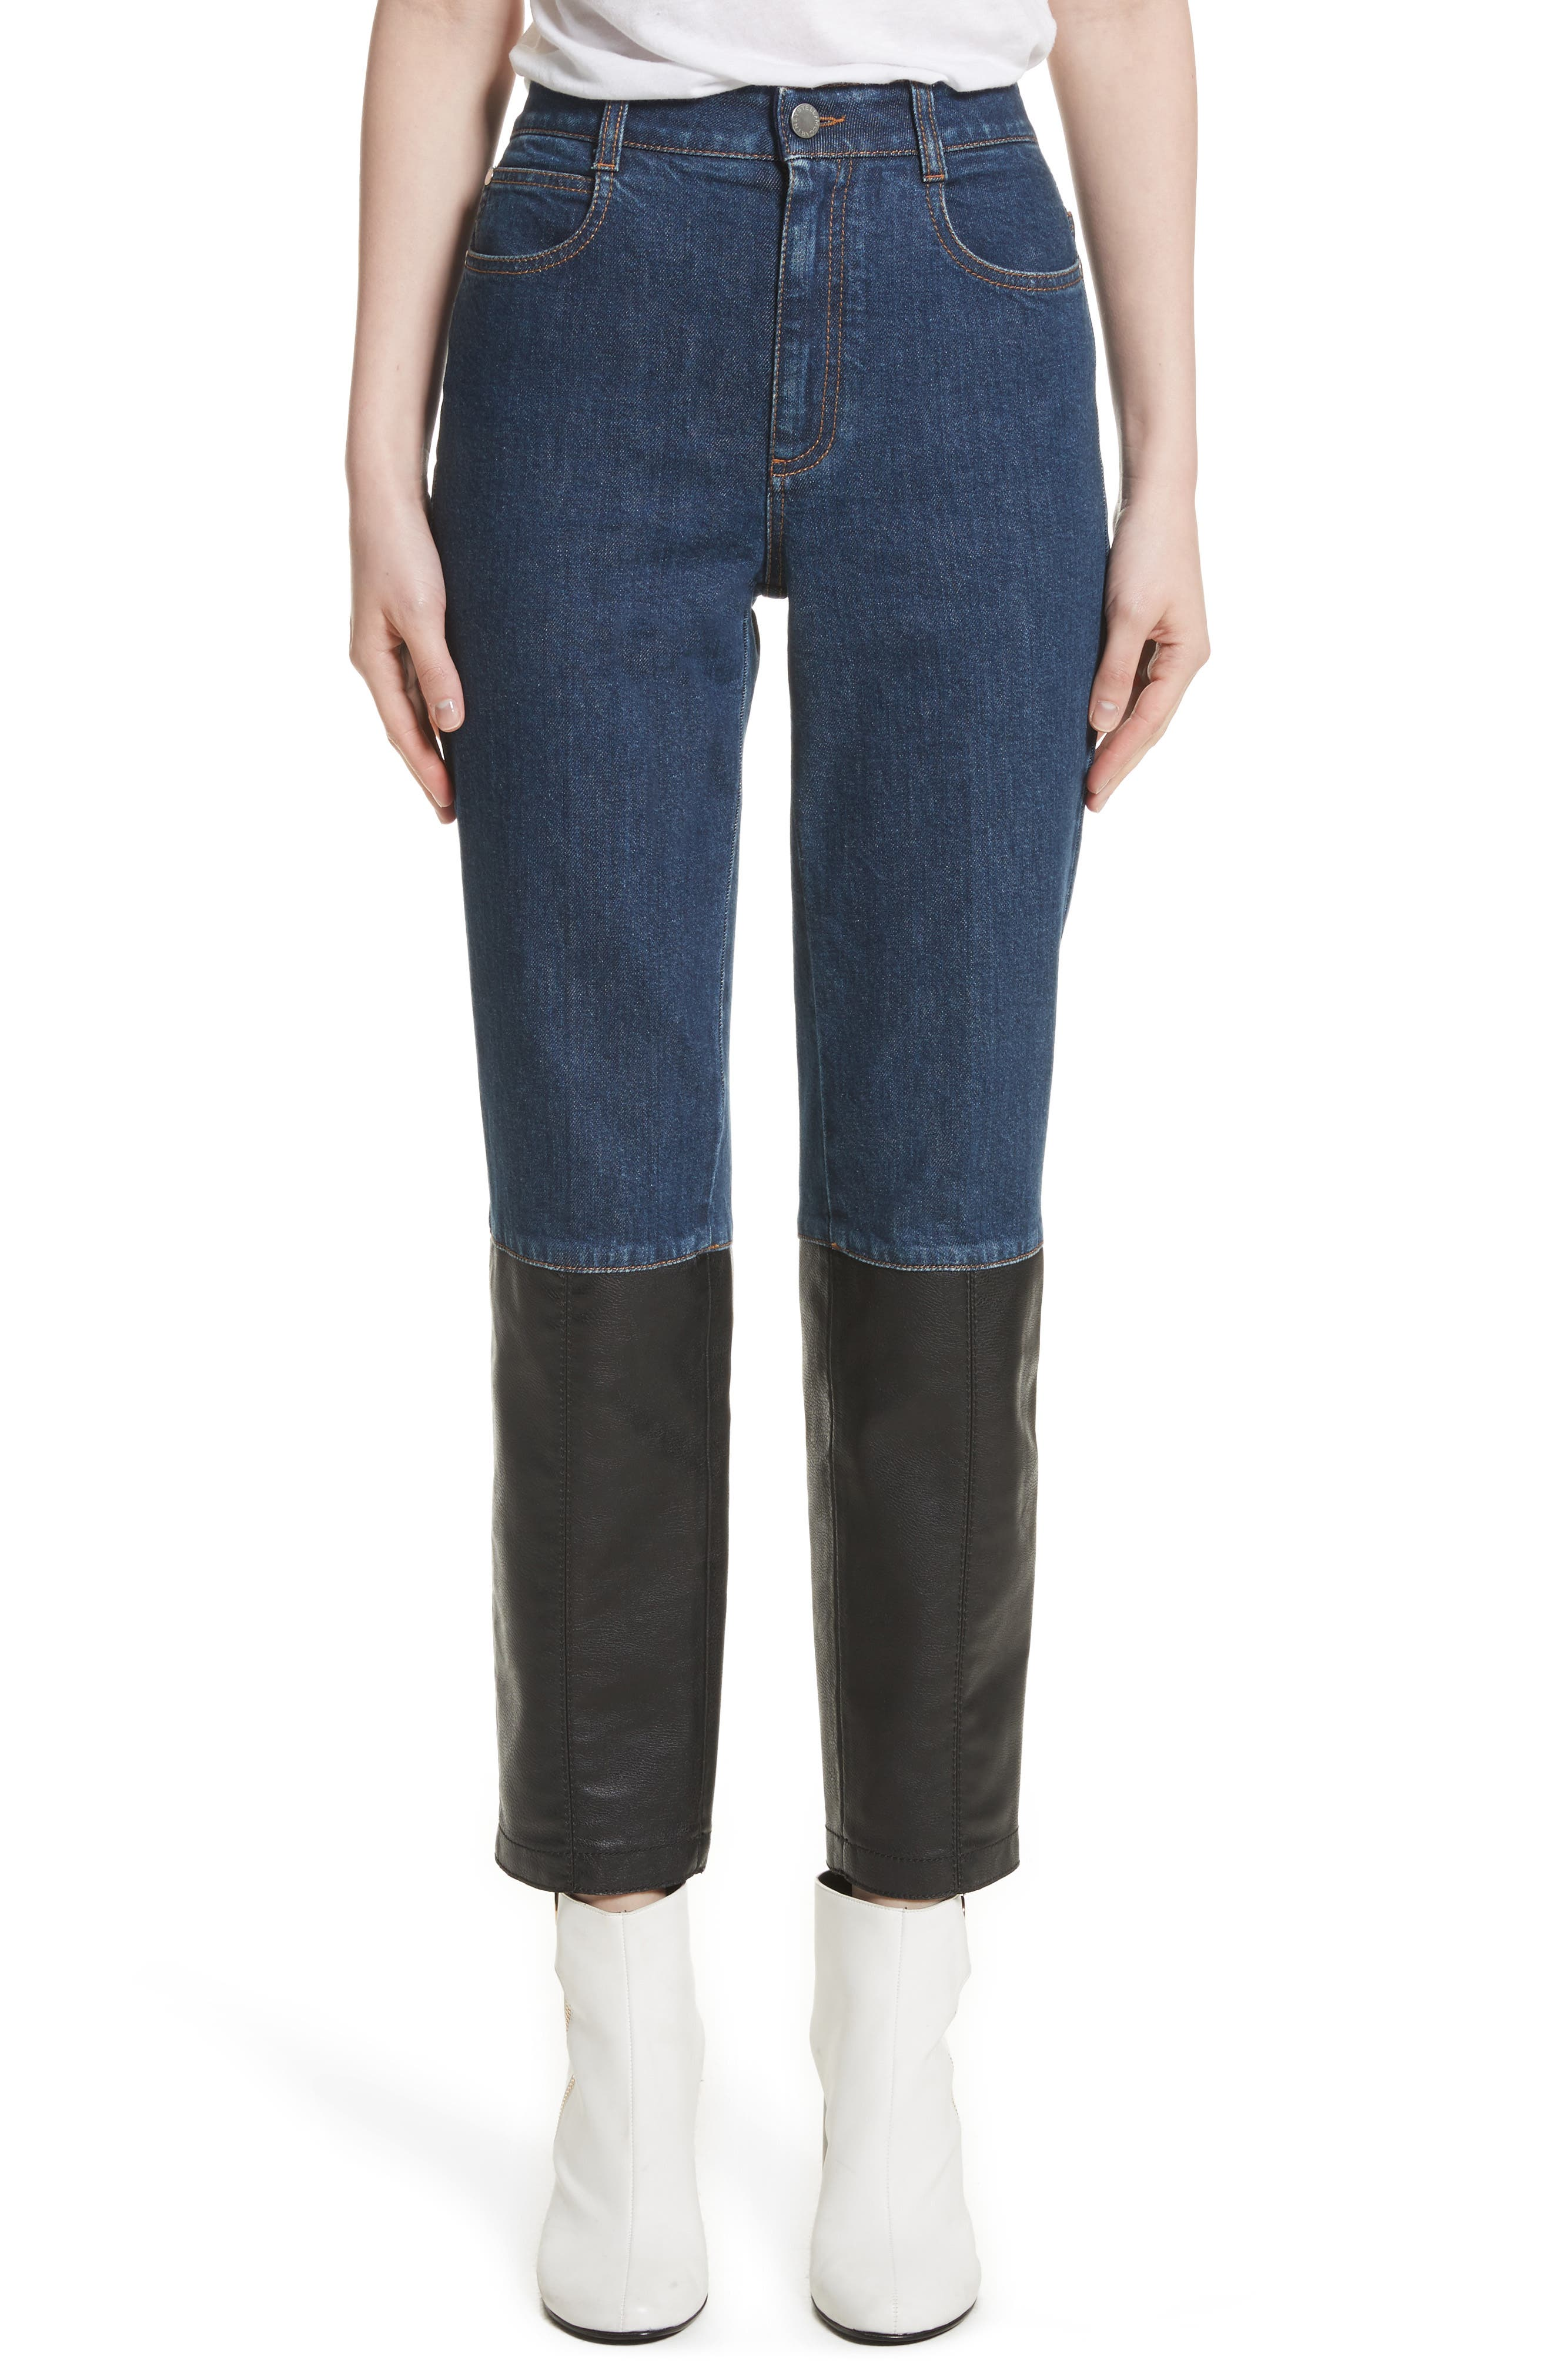 Alter Leather Trim High Waist Straight Leg Jeans,                         Main,                         color, Blue Jeans